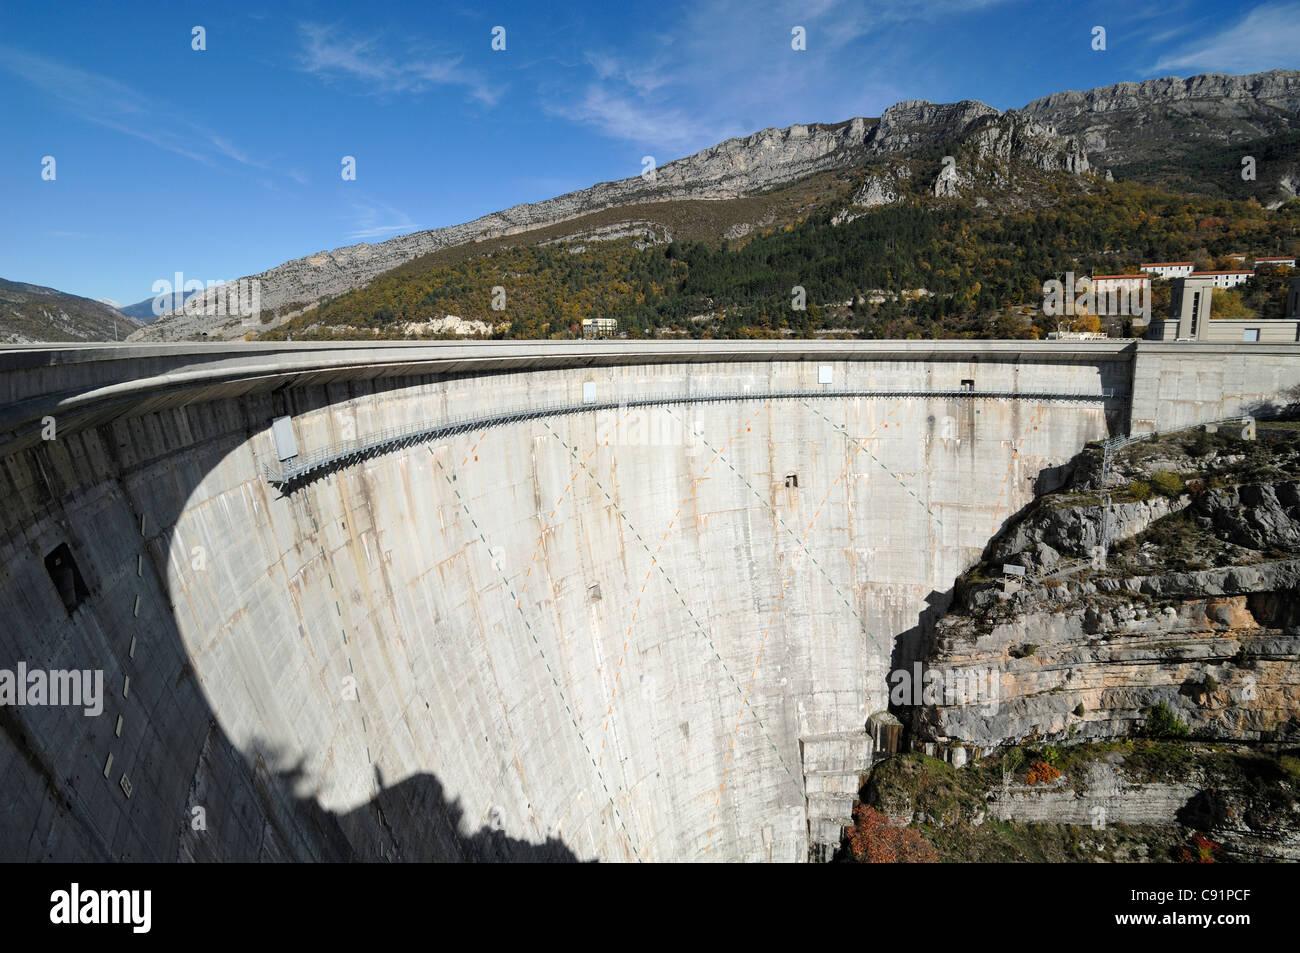 Castillon Barrage or Dam & Hydro-Electric Power Station, Verdon Valley or Gorge, near Castallane, France - Stock Image